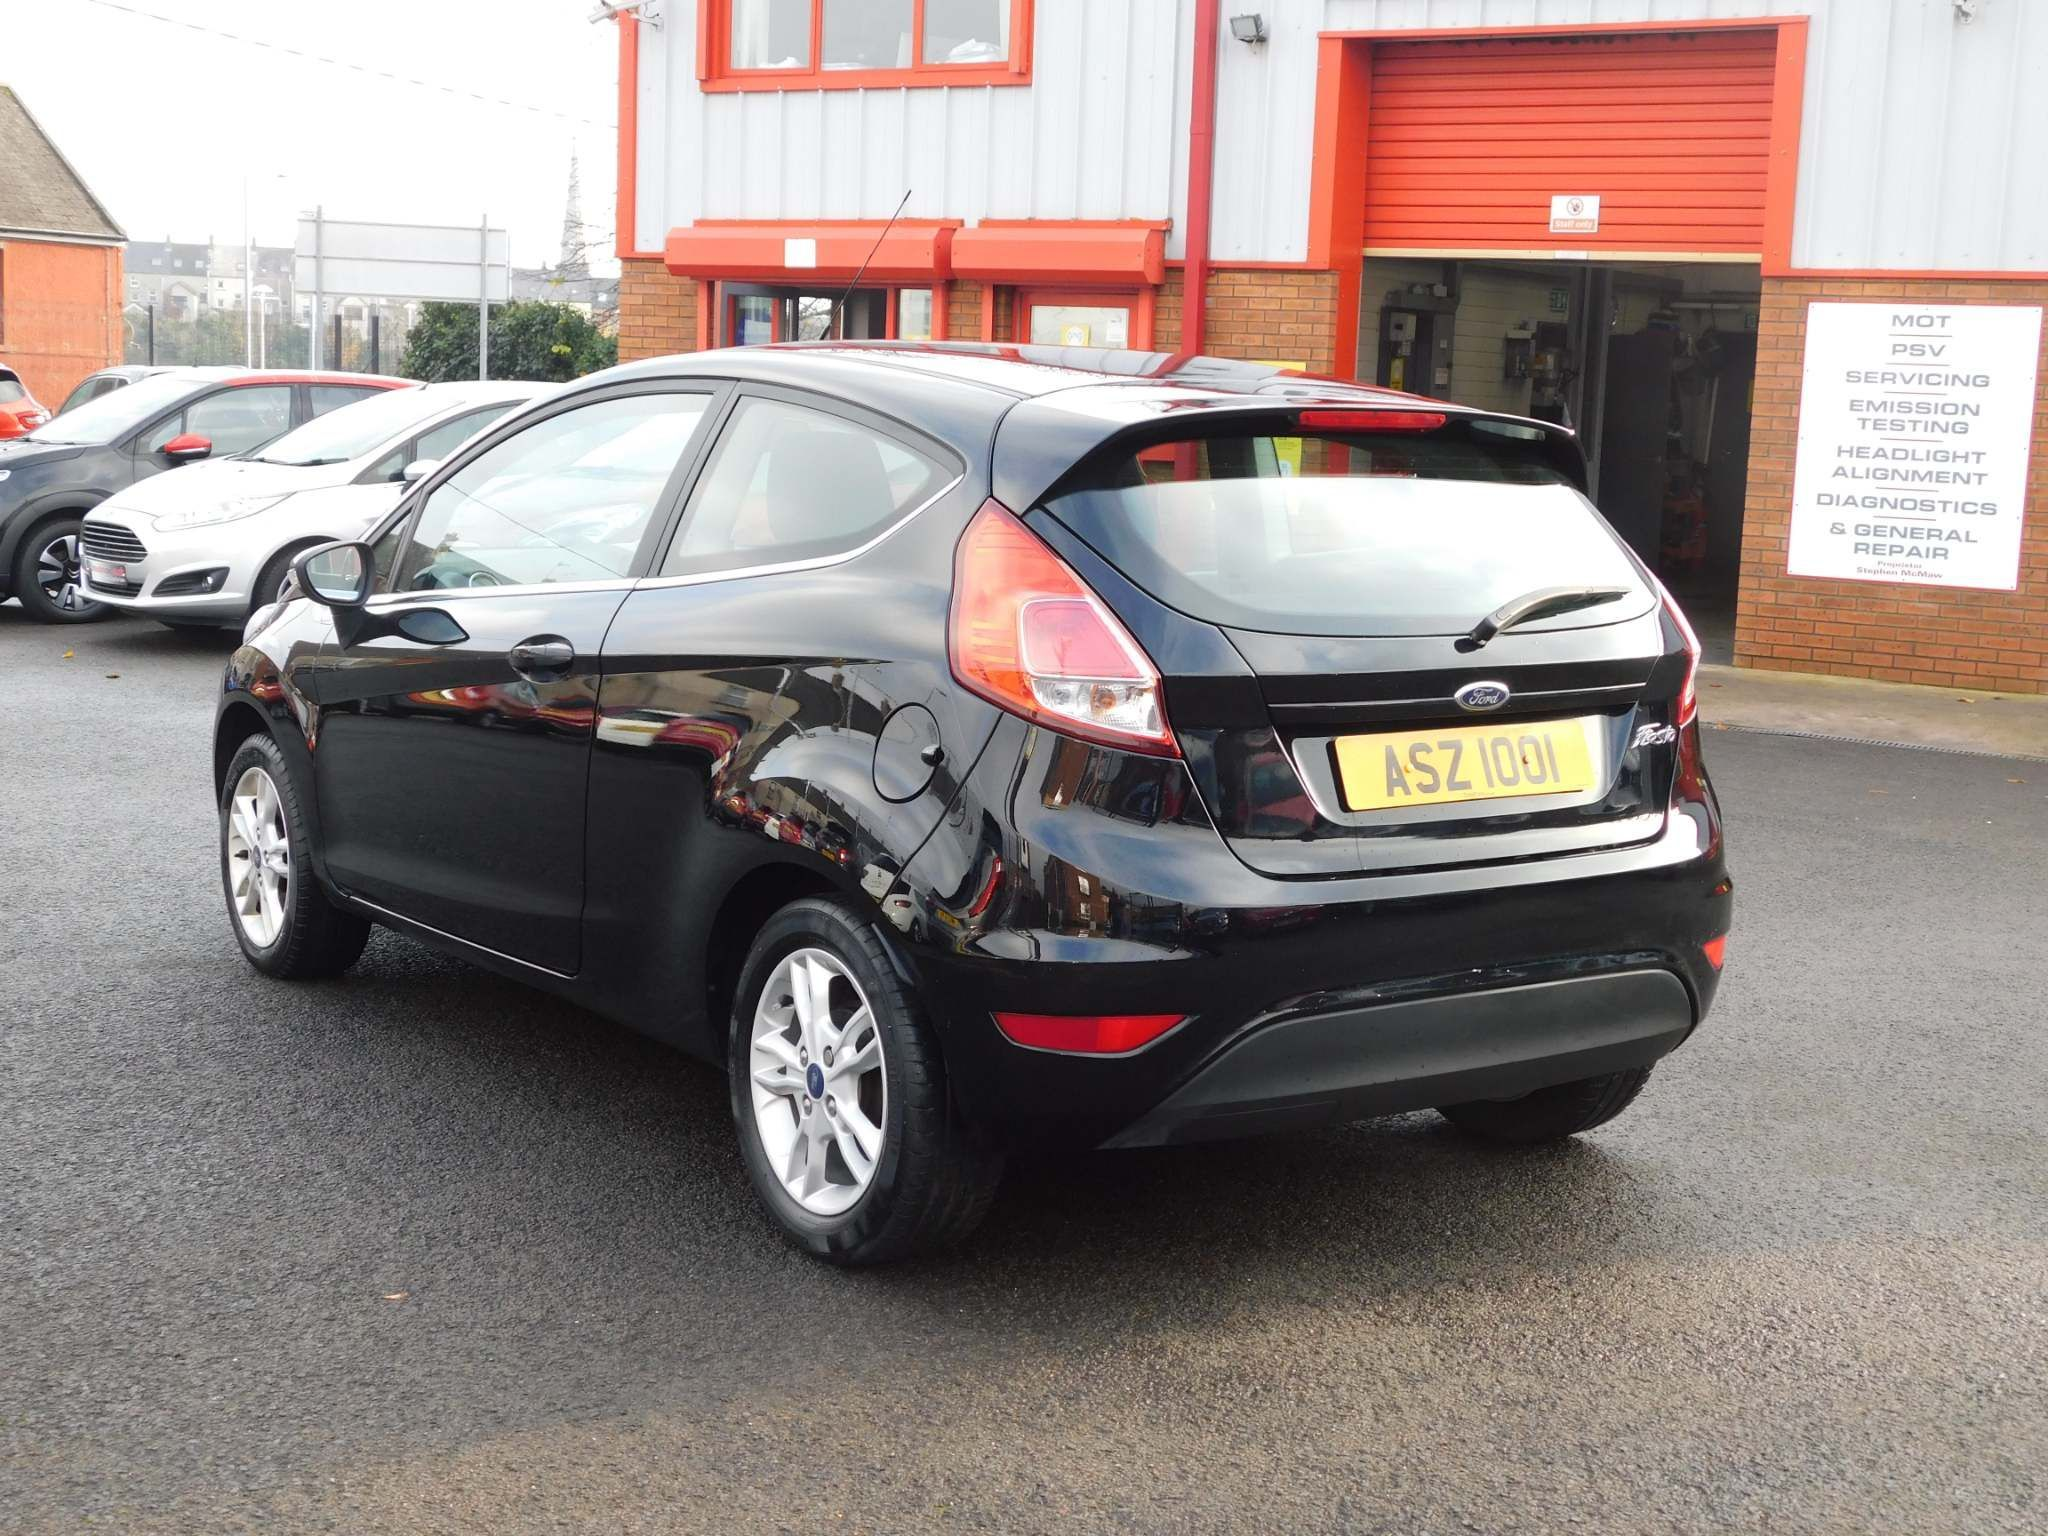 2016 FORD Fiesta 1.25 Zetec Petrol Manual just arrived – Meadow Cars Carrickfergus full